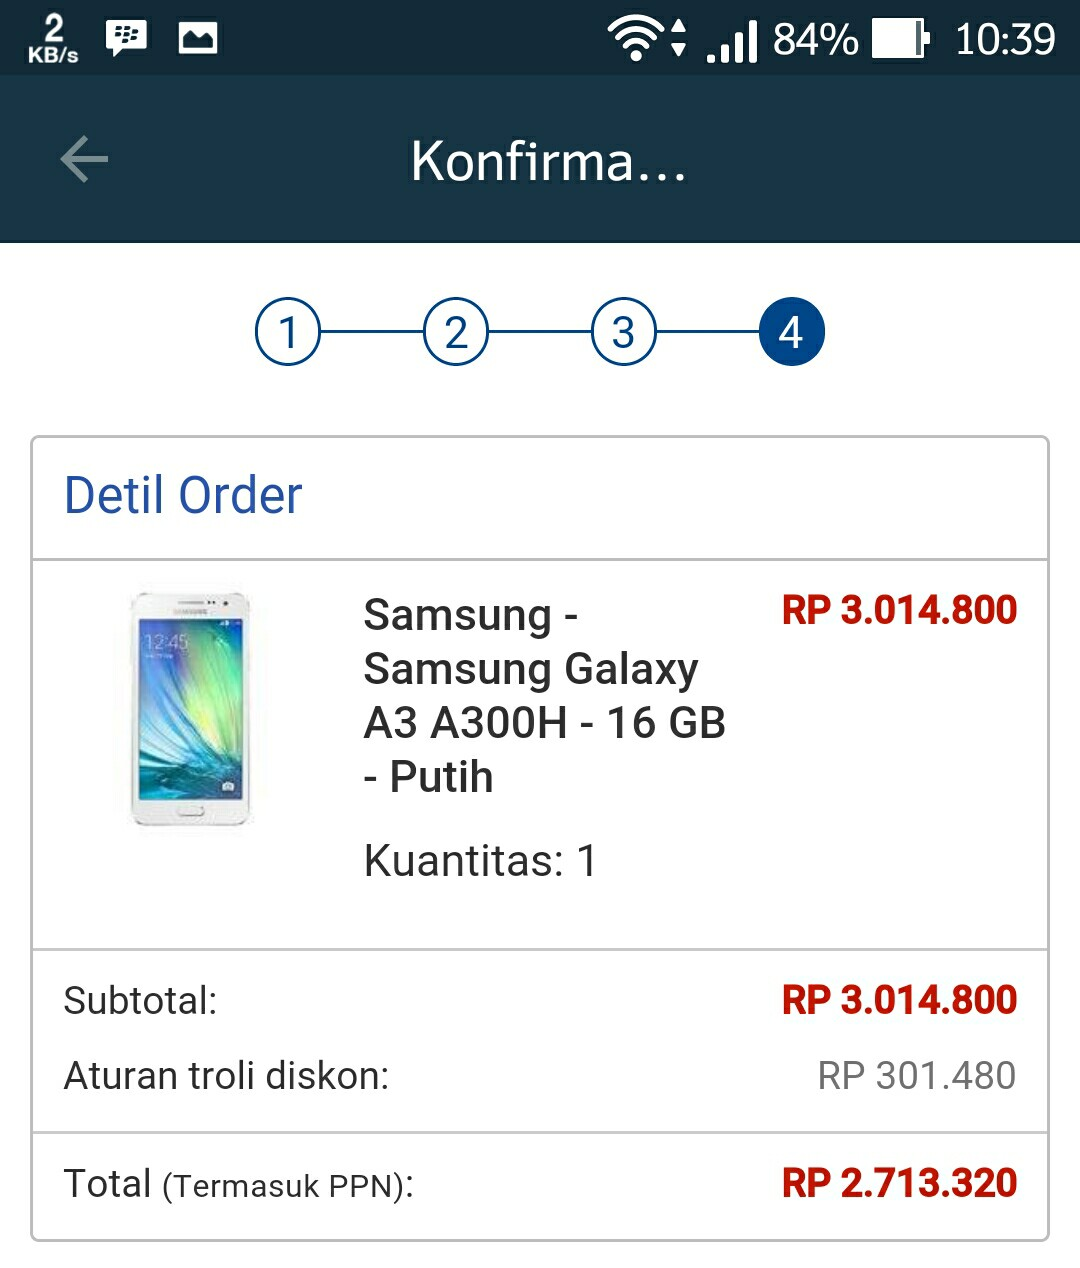 Harga Samsung Galaxy A3 Hari Ini Cuma Rp 2,7 Juta di #LazadaID, Mau?